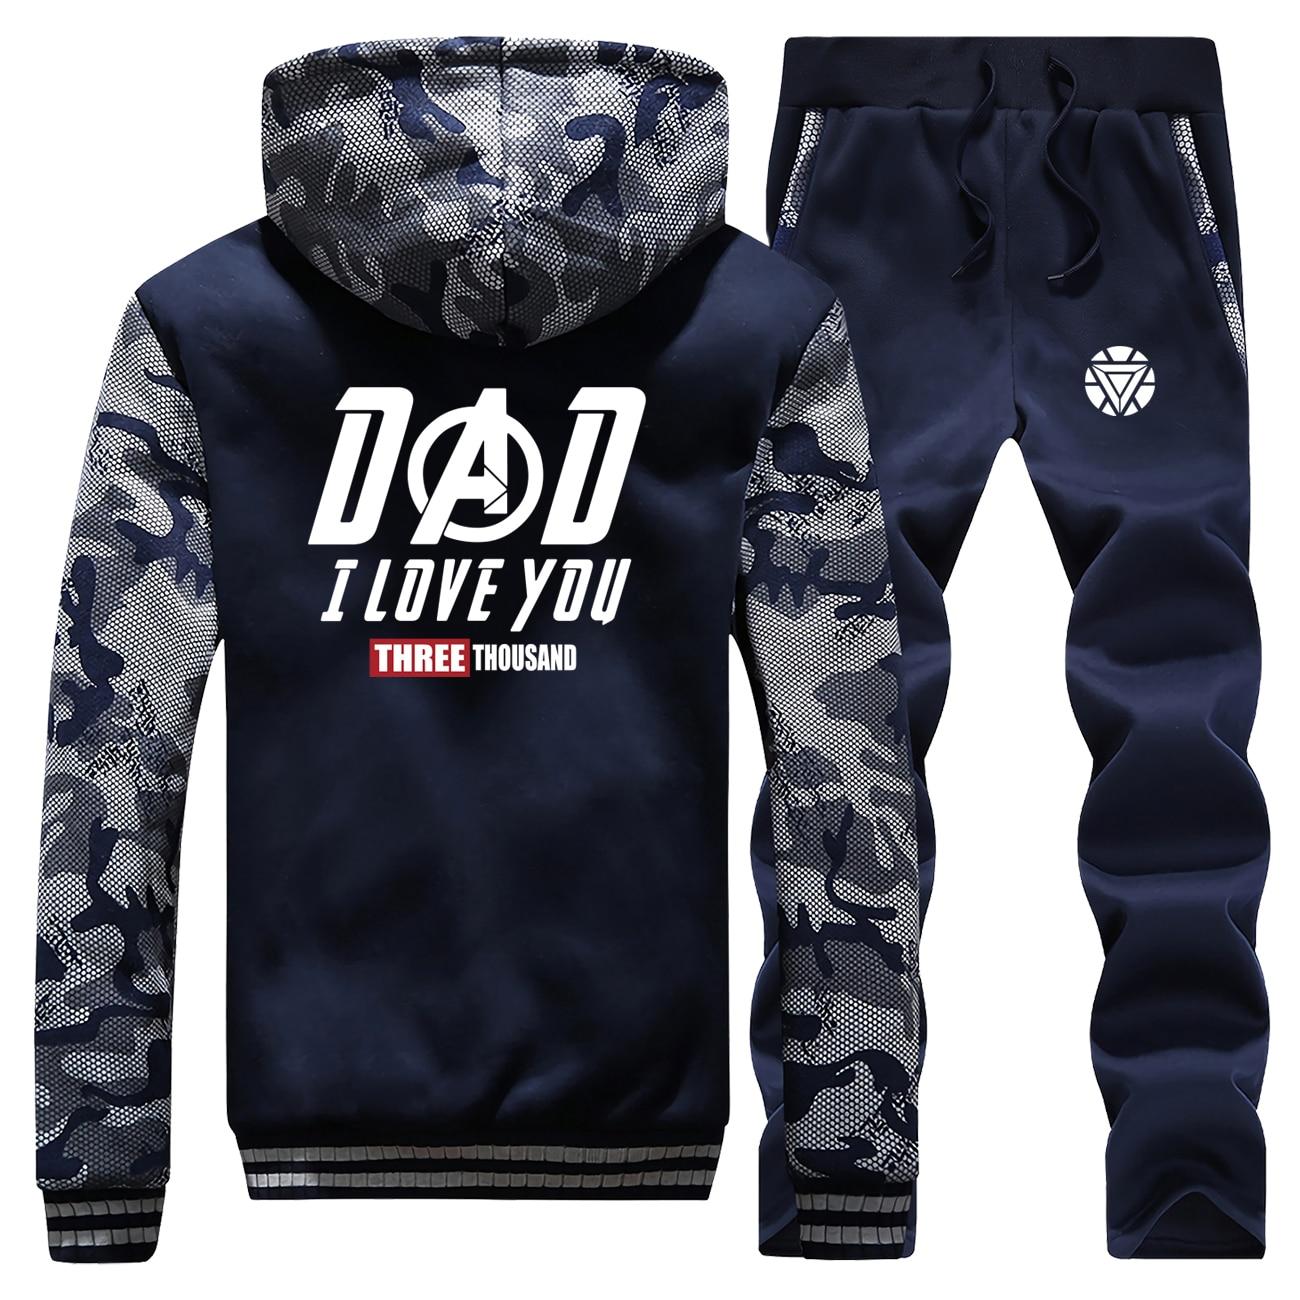 Tony Stark I Love You Three Thousand Thick Camouflage Hoodies+Pants 2 Piece Sets Coat Men Winter Warm Sweatshirt Iron Man Jacket